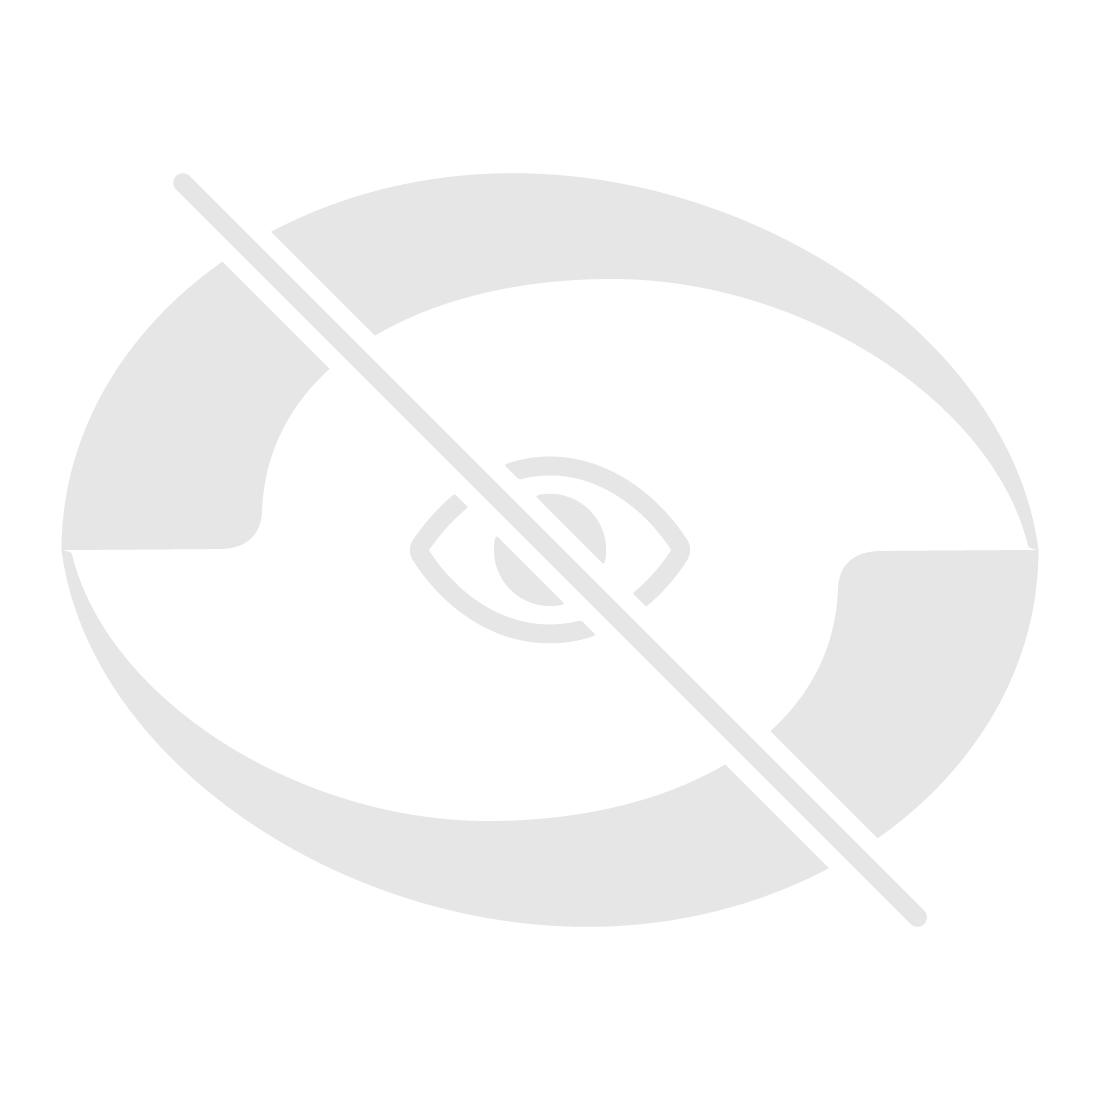 GeoVision GV-800B-04 • 4 channel hybrid video capture card